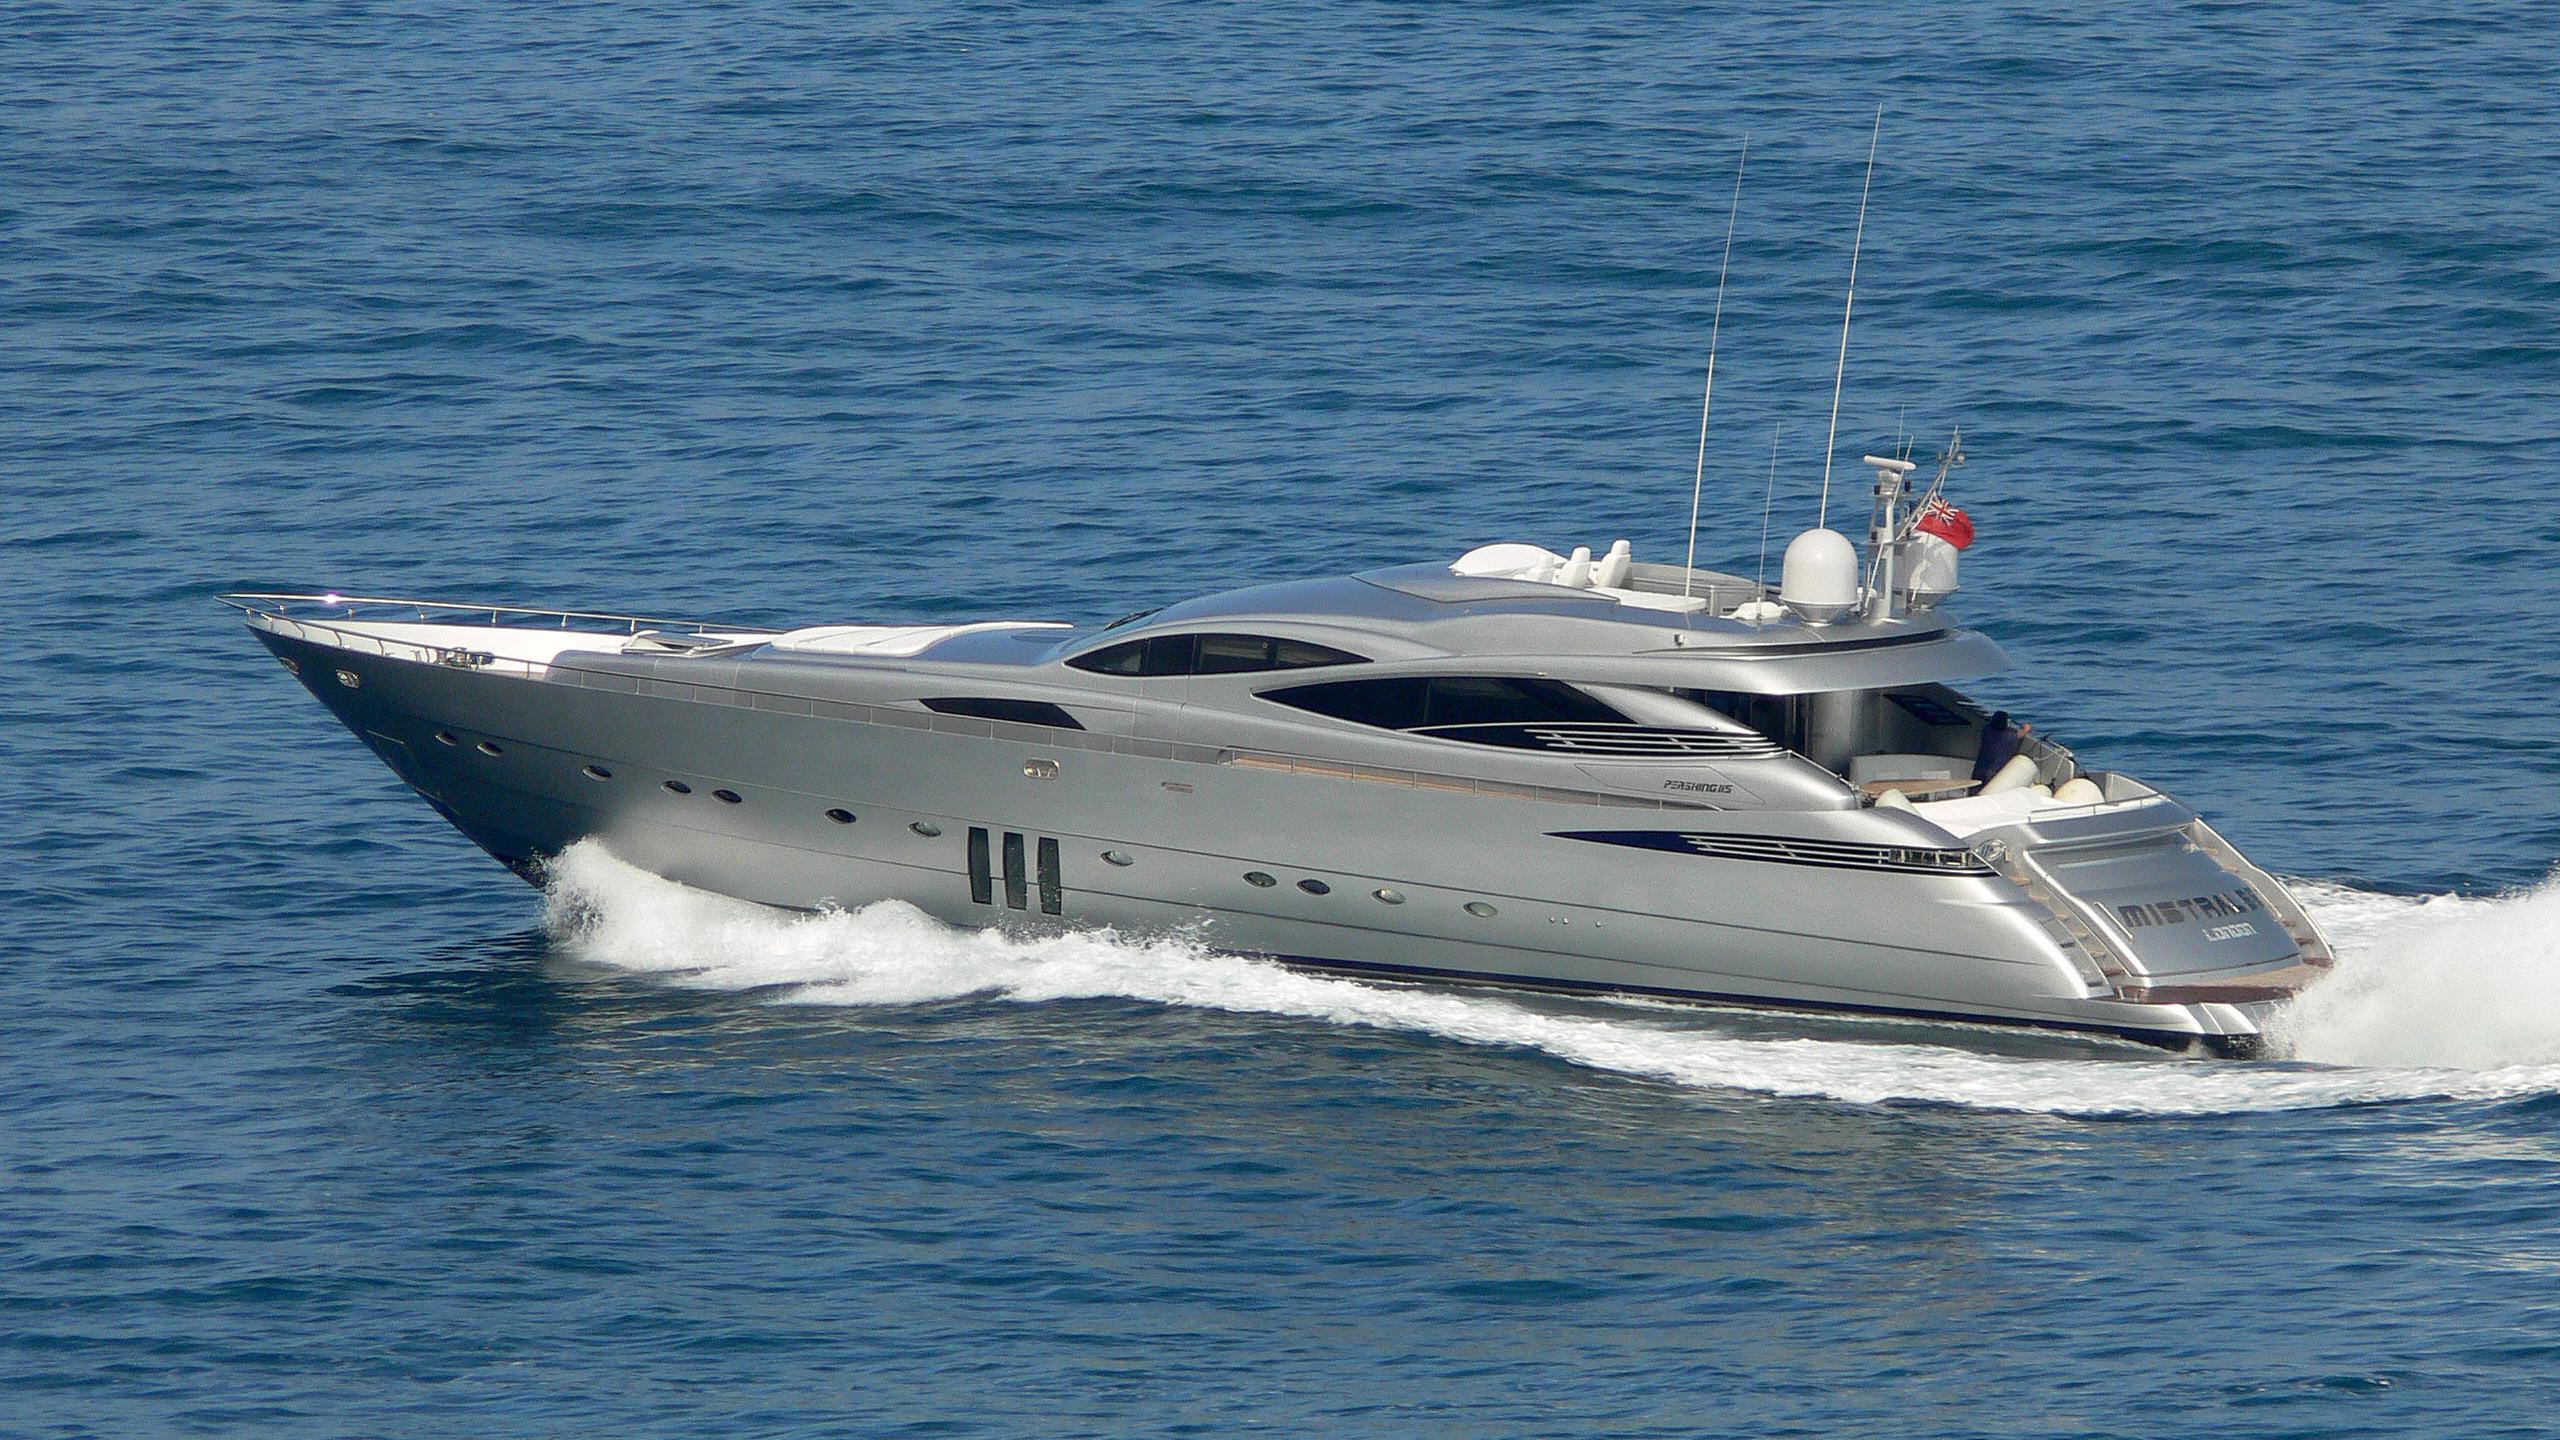 shooting-star-mistral-55-motor-yacht-pershing-115-2006-35m-cruising-exterior